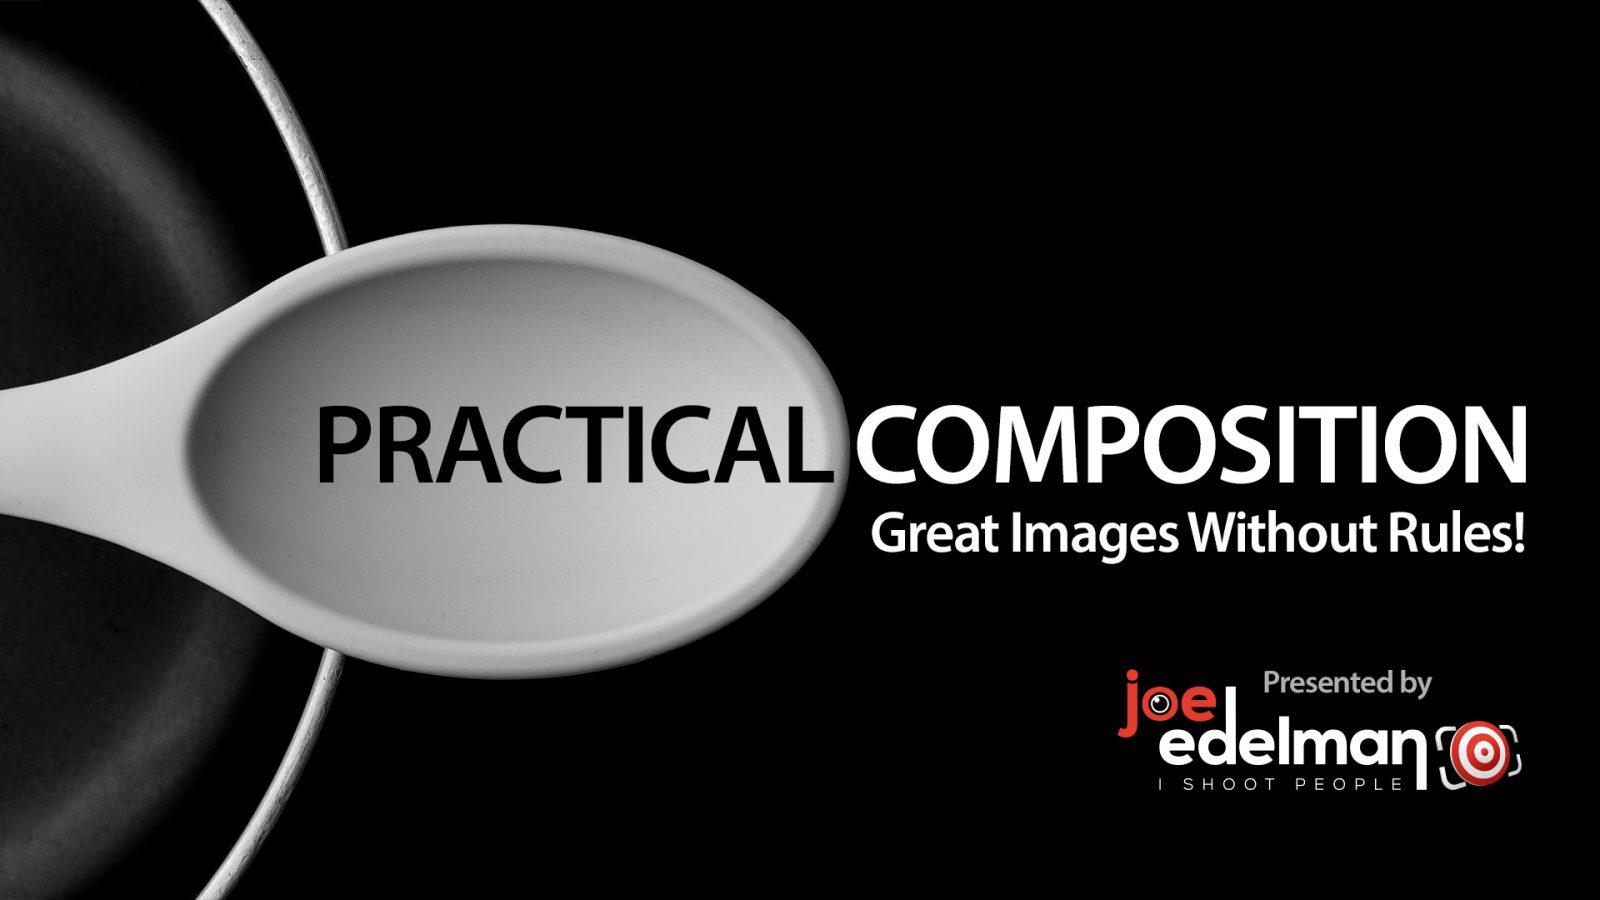 Practical Composition